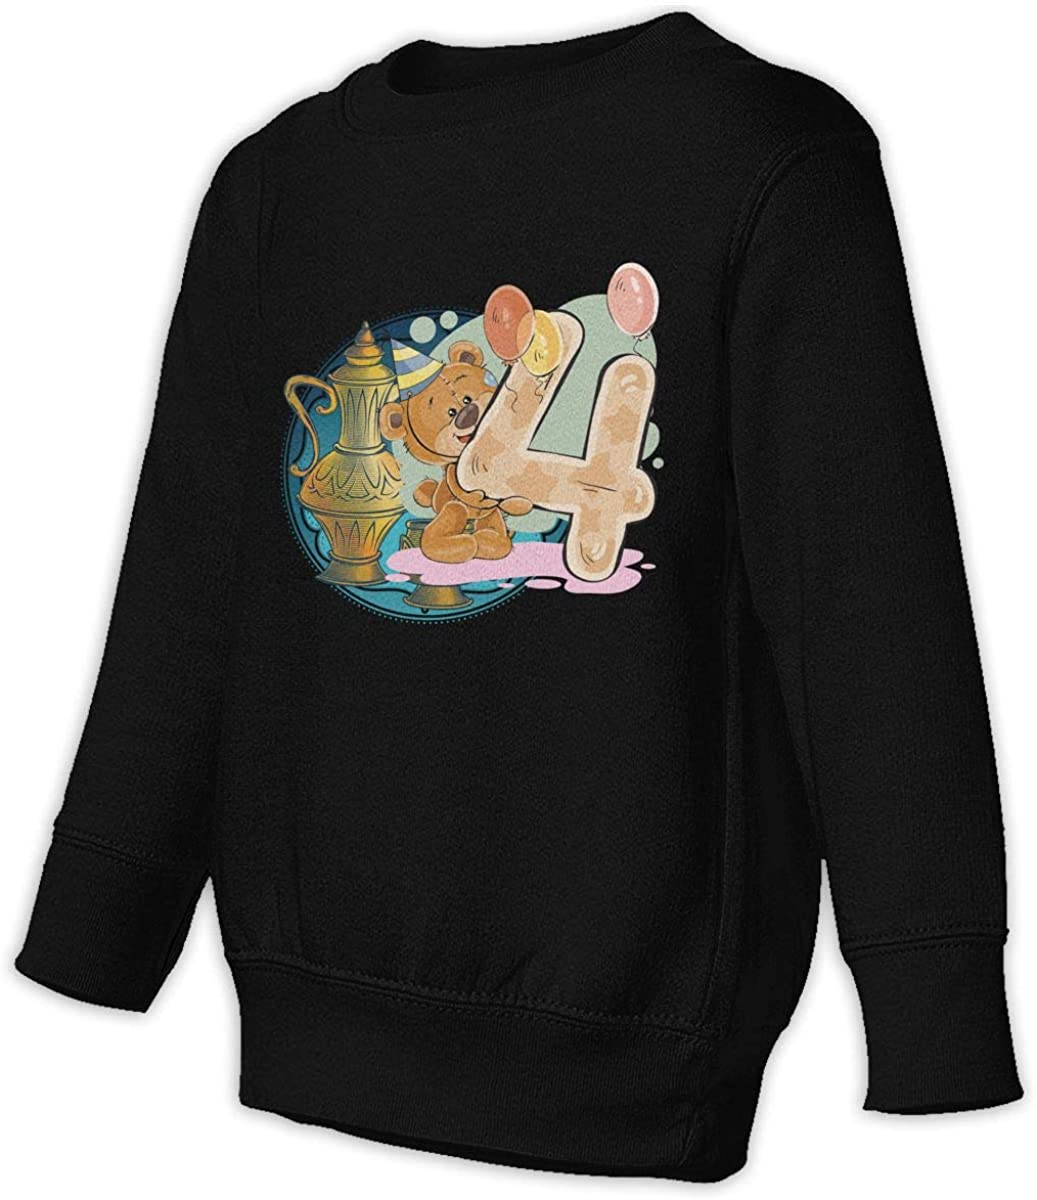 Bear Figure 4 Unisex Toddler Hoodies Fleece Pull Over Sweatshirt for Boys Girls Kids Youth